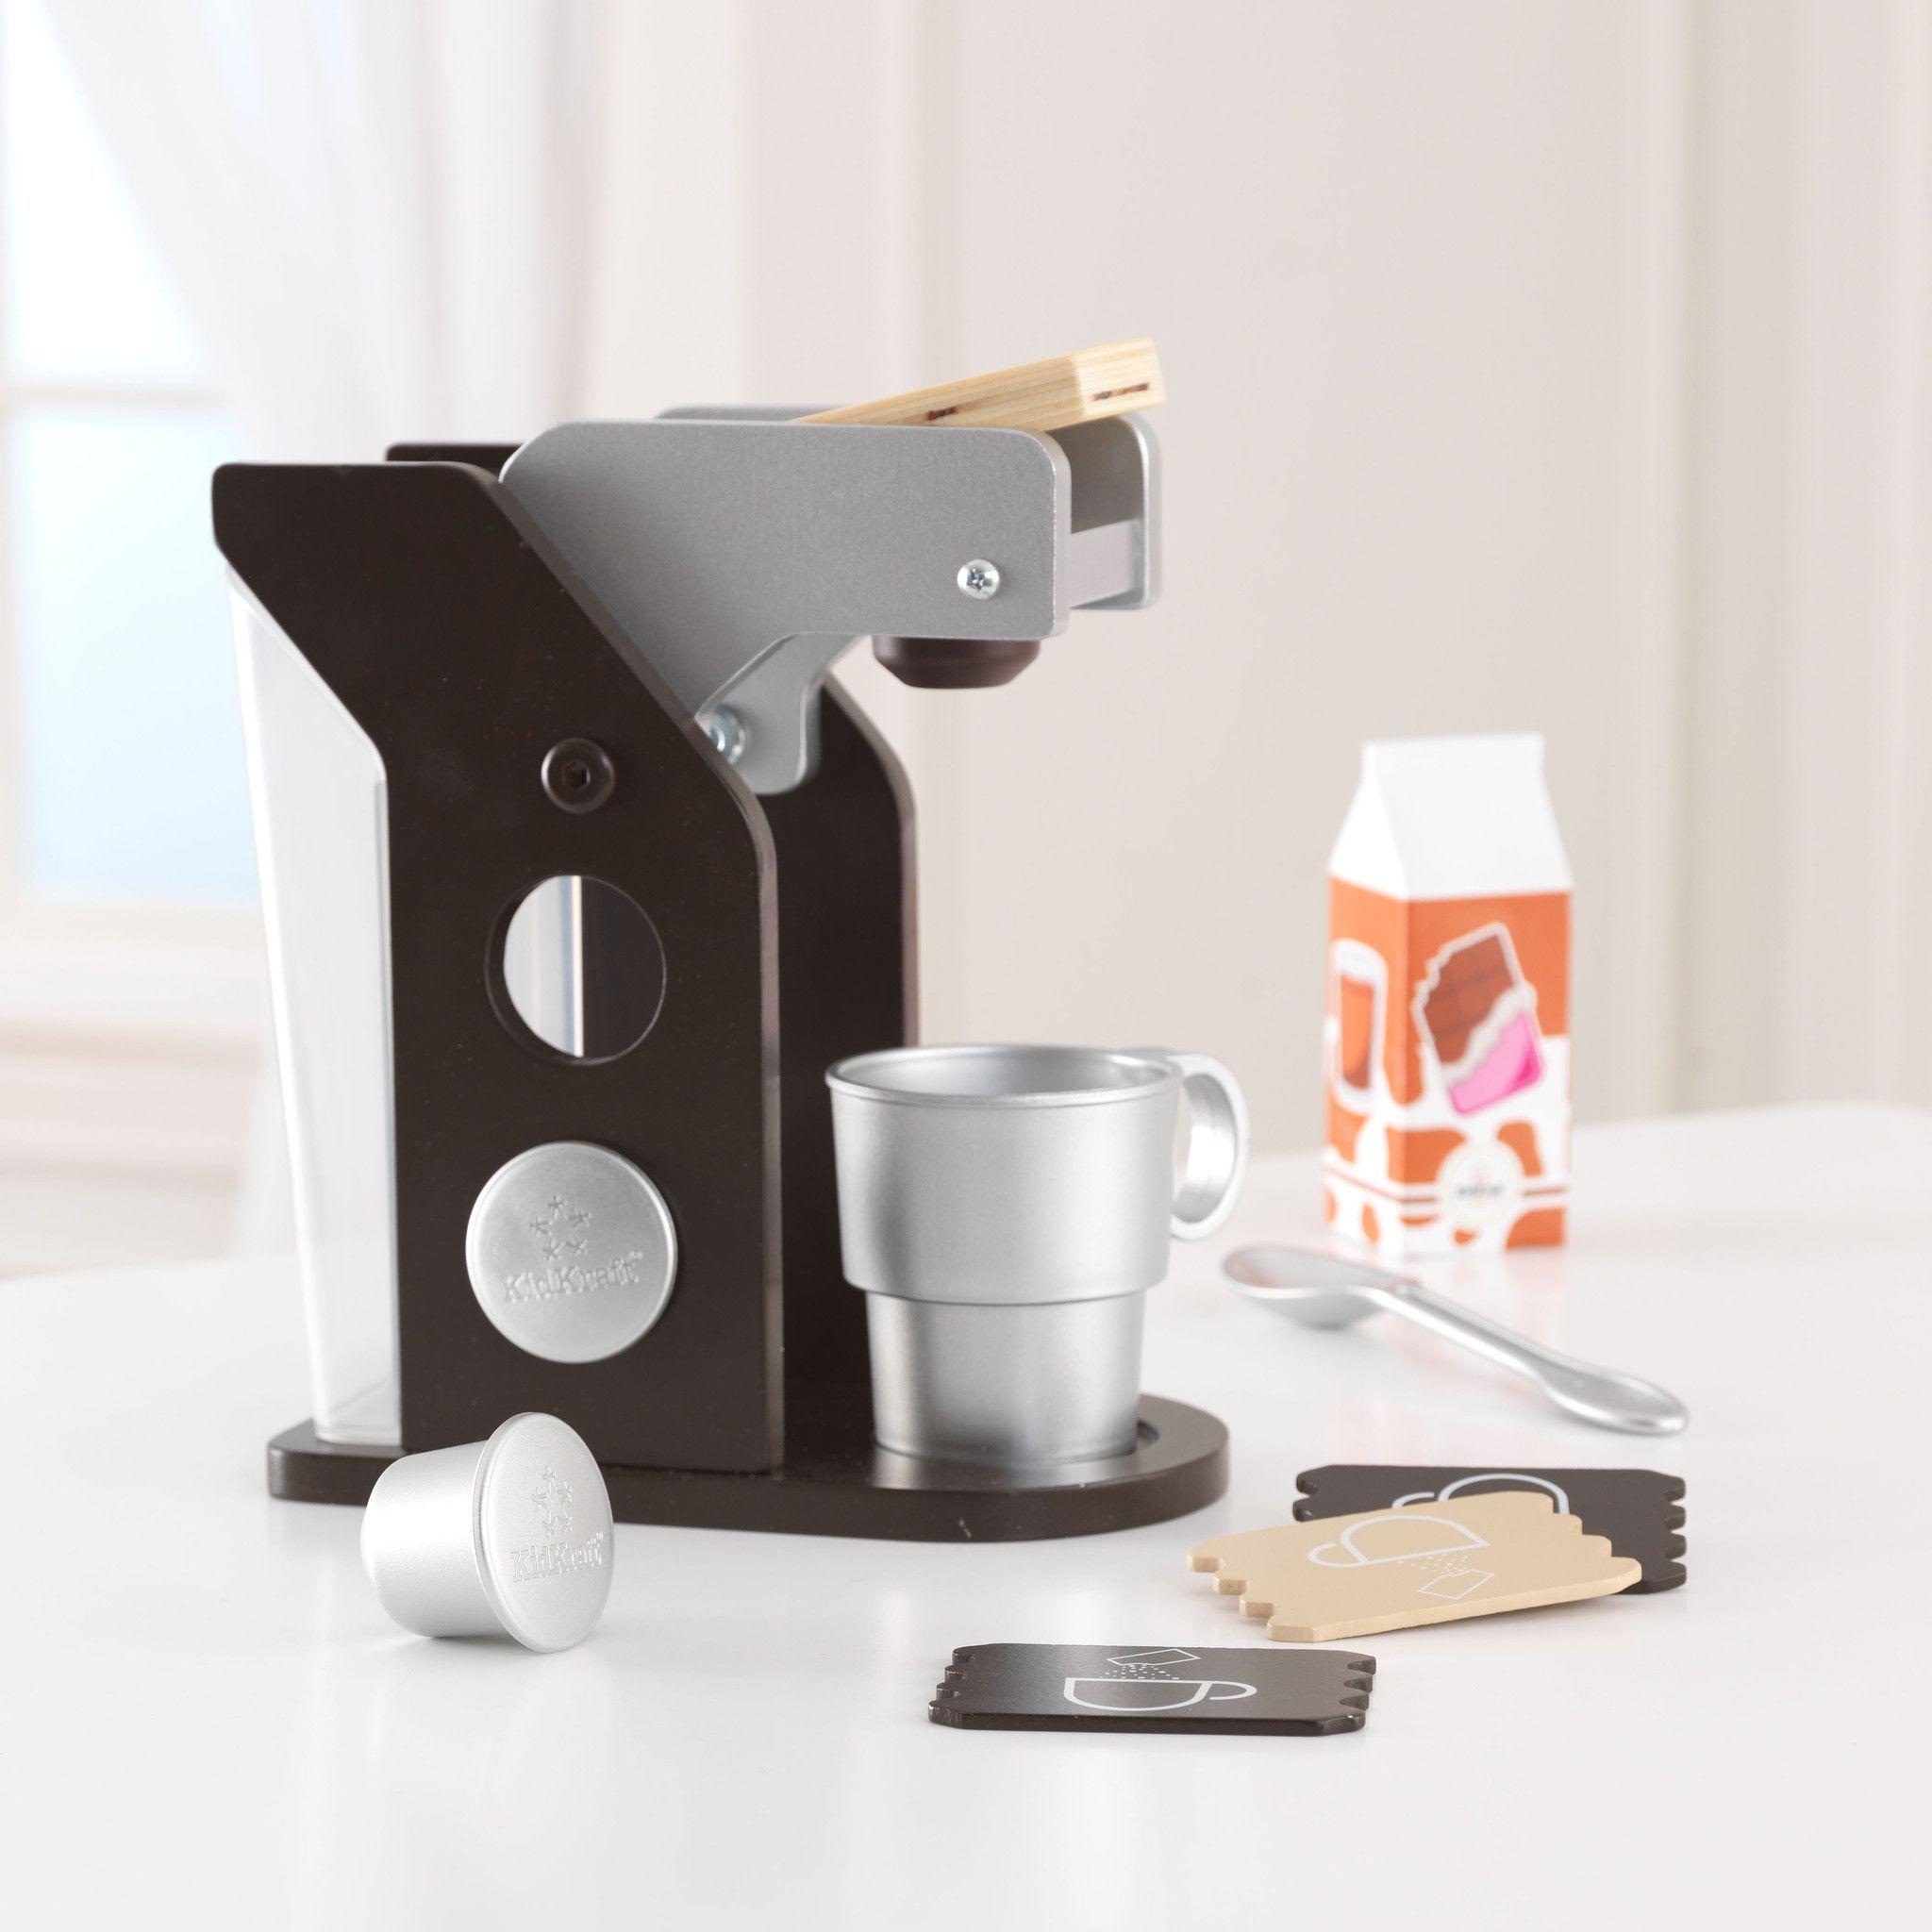 KidKraft Espresso Coffee Set - 63379 | Kid kraft, Espresso coffee ...